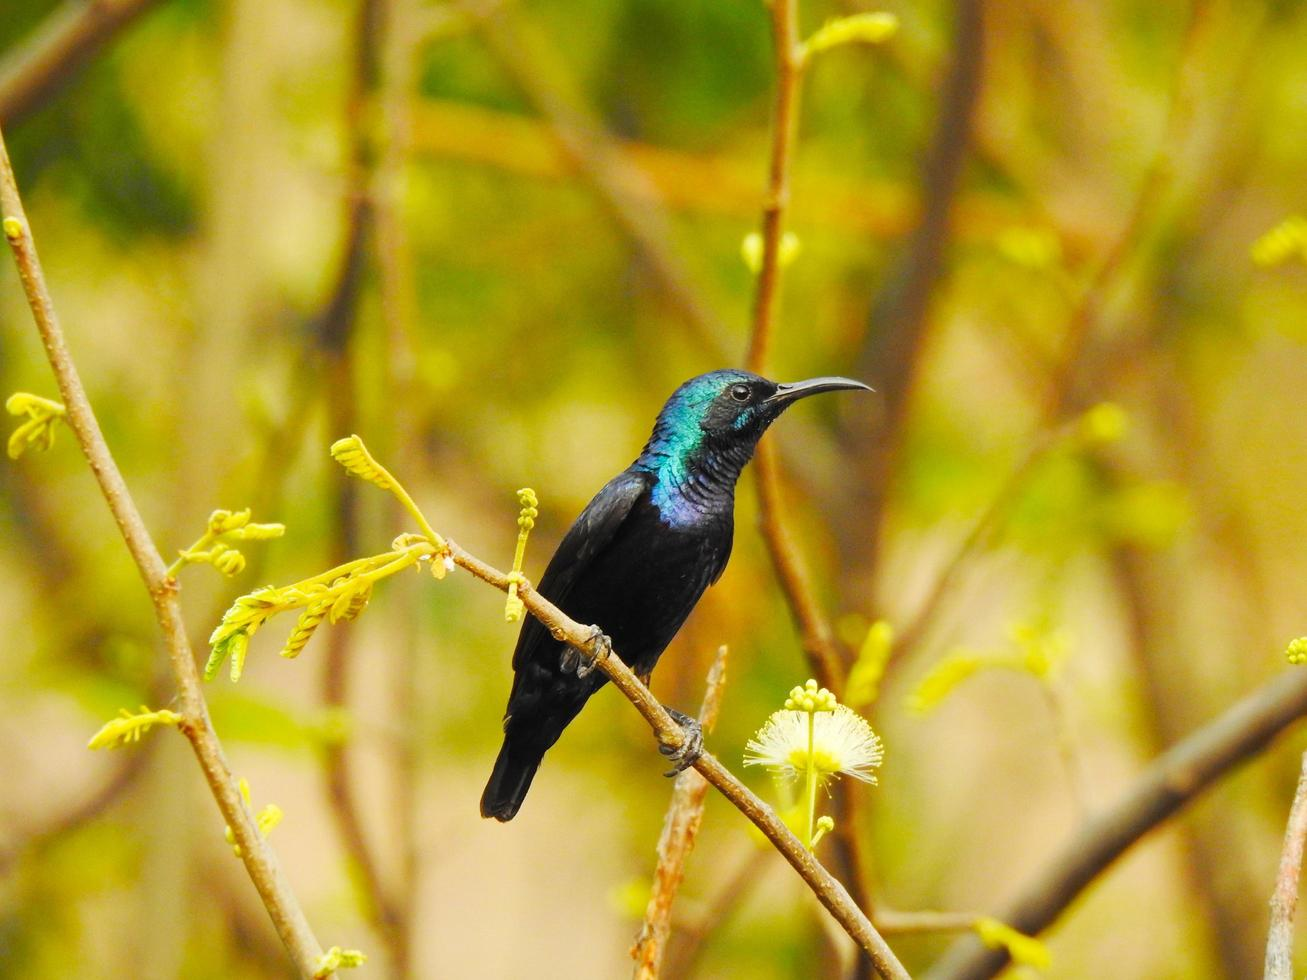 Hummingbird on branch photo